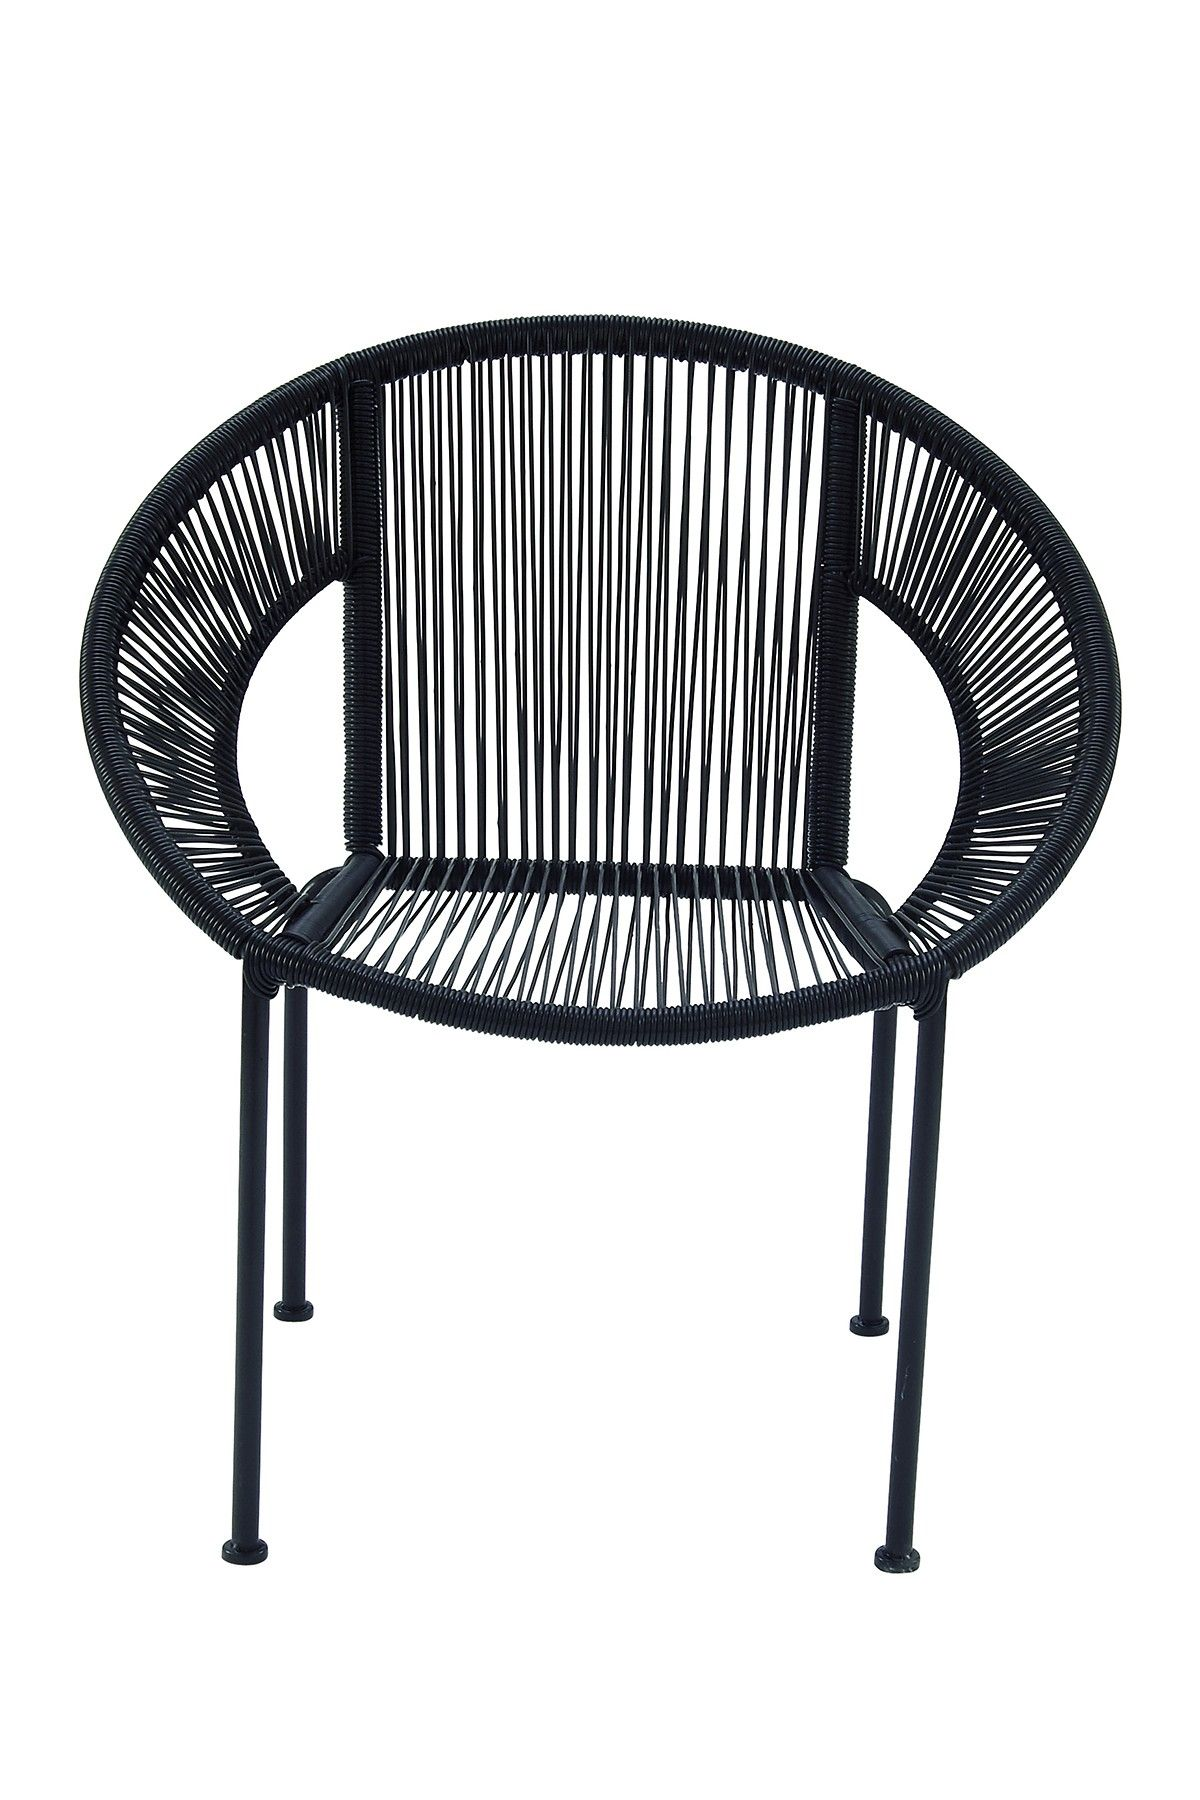 plastic metal chairs. $99 Metal \u0026 Plastic Chair By UMA On @HauteLook Chairs F